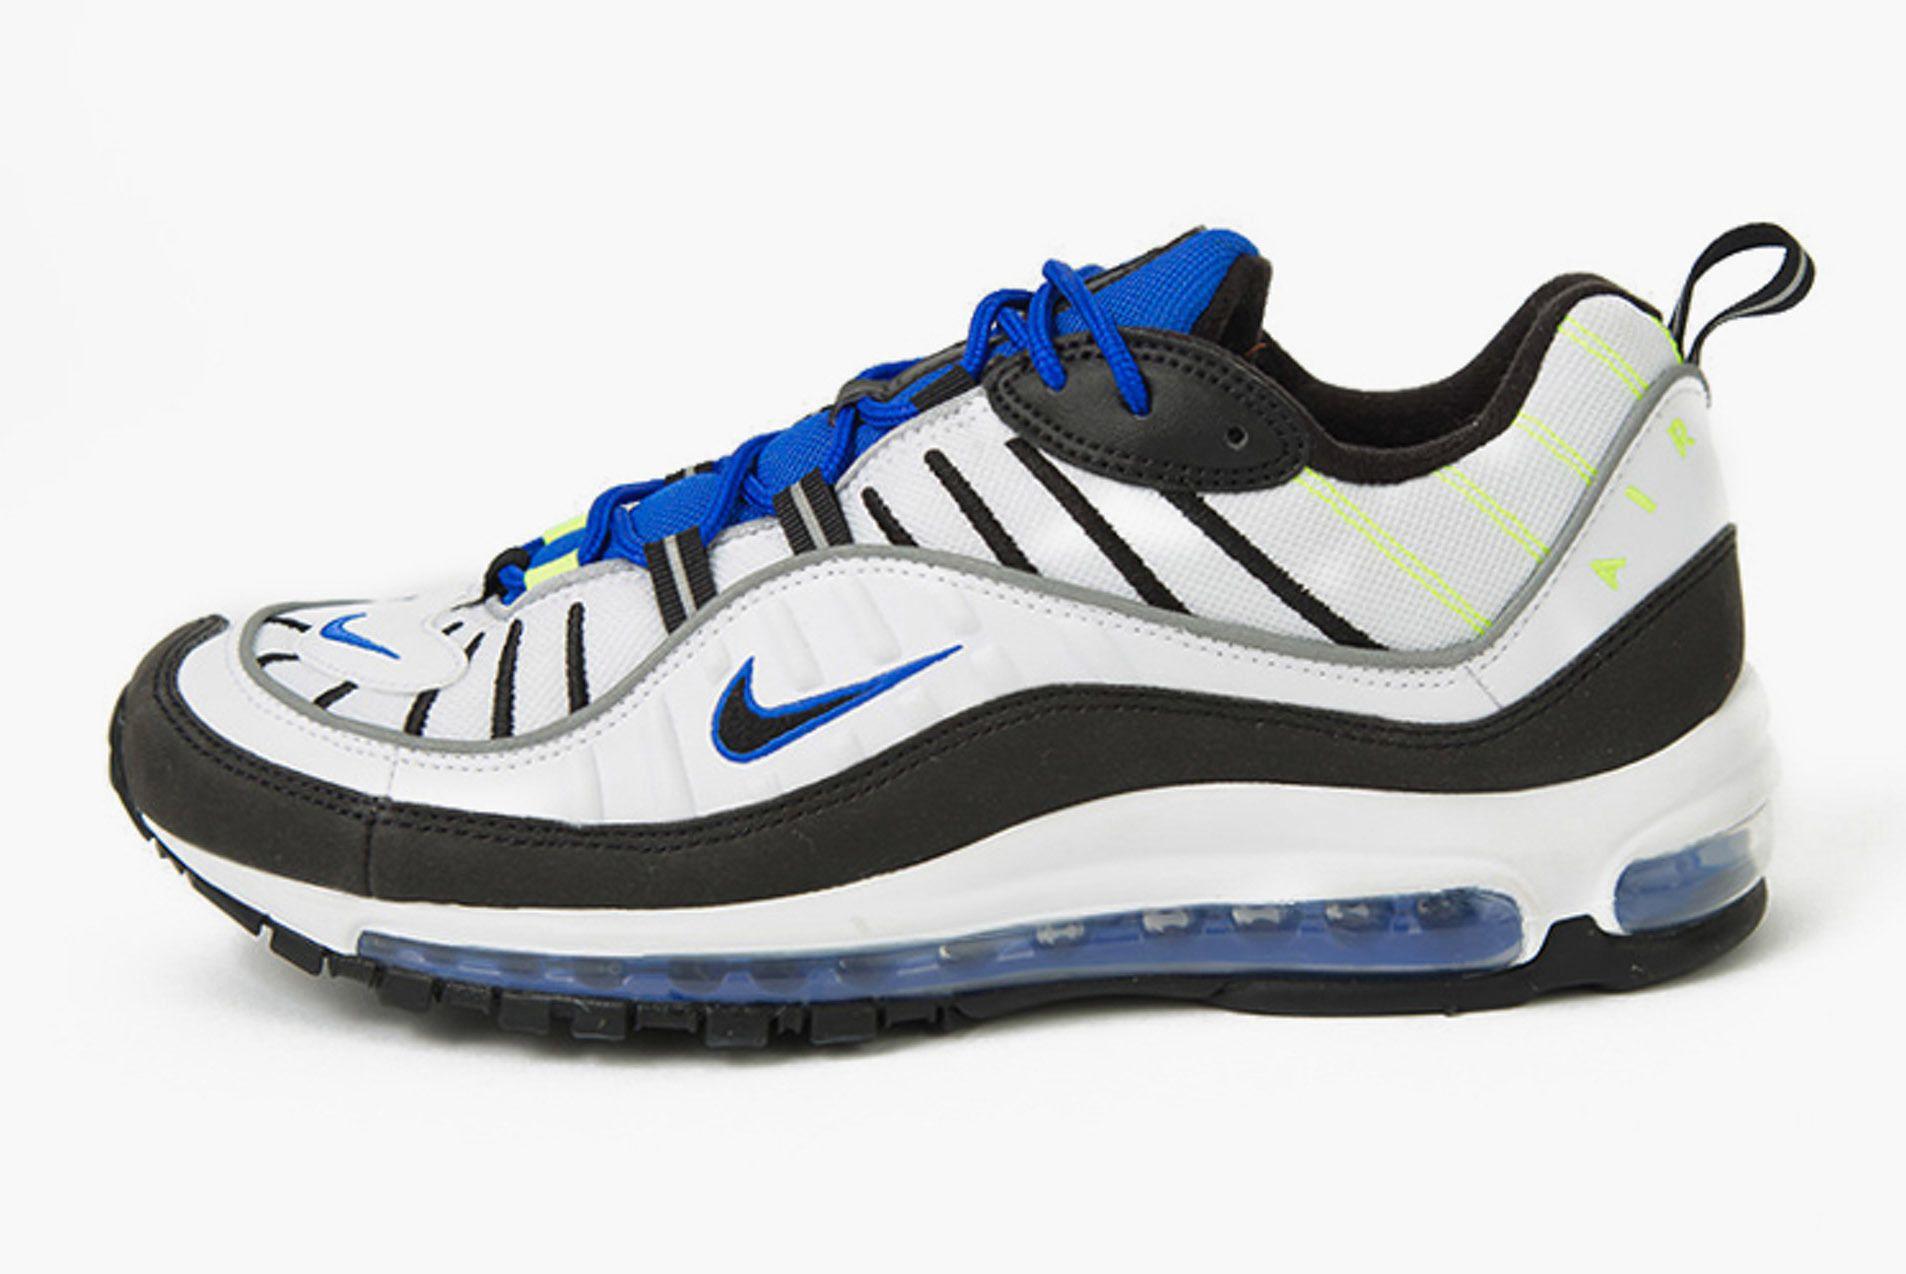 Nike Air Max 98 Racer Blue Release Info 002 Sneaker Freaker